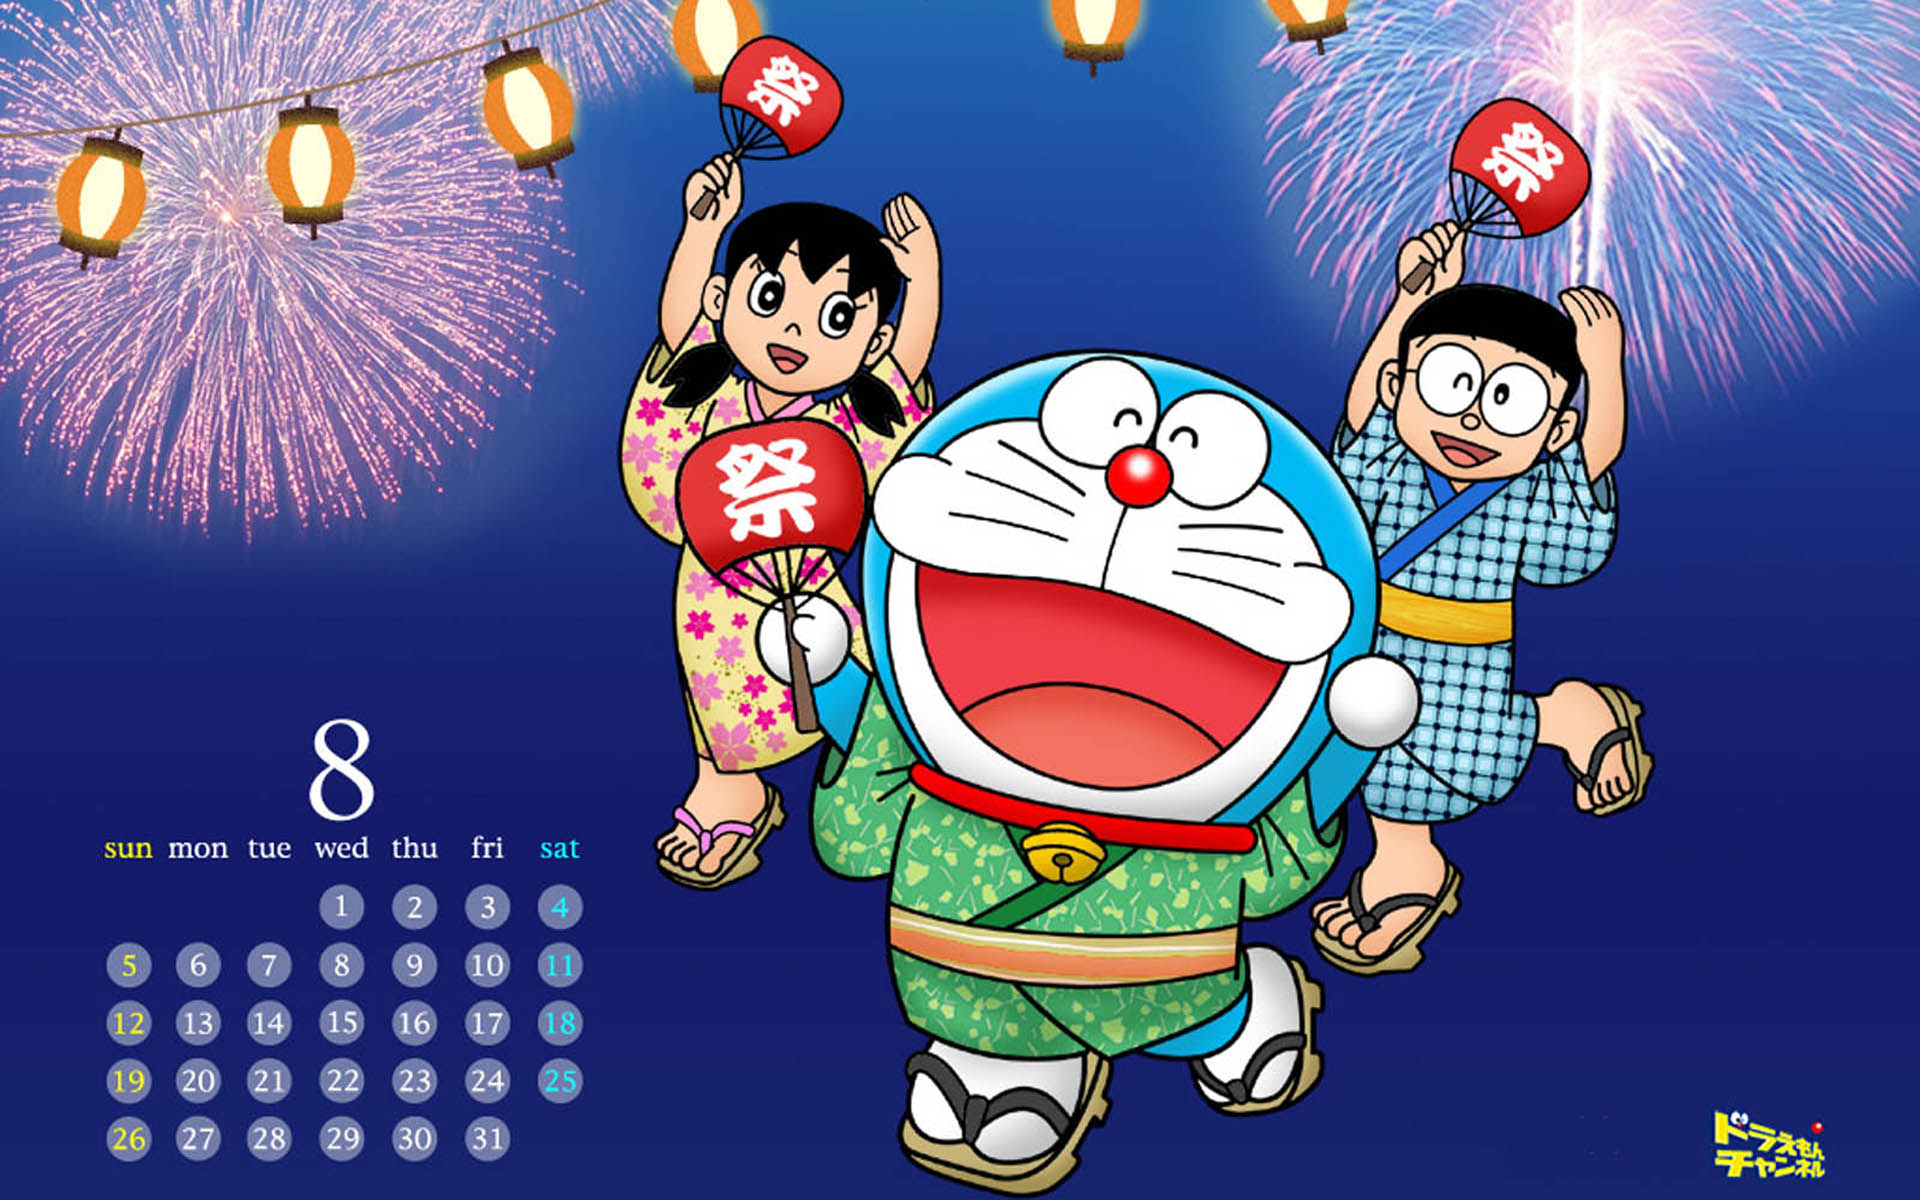 Doraemon 3d wallpapers HD   382336 1920x1200